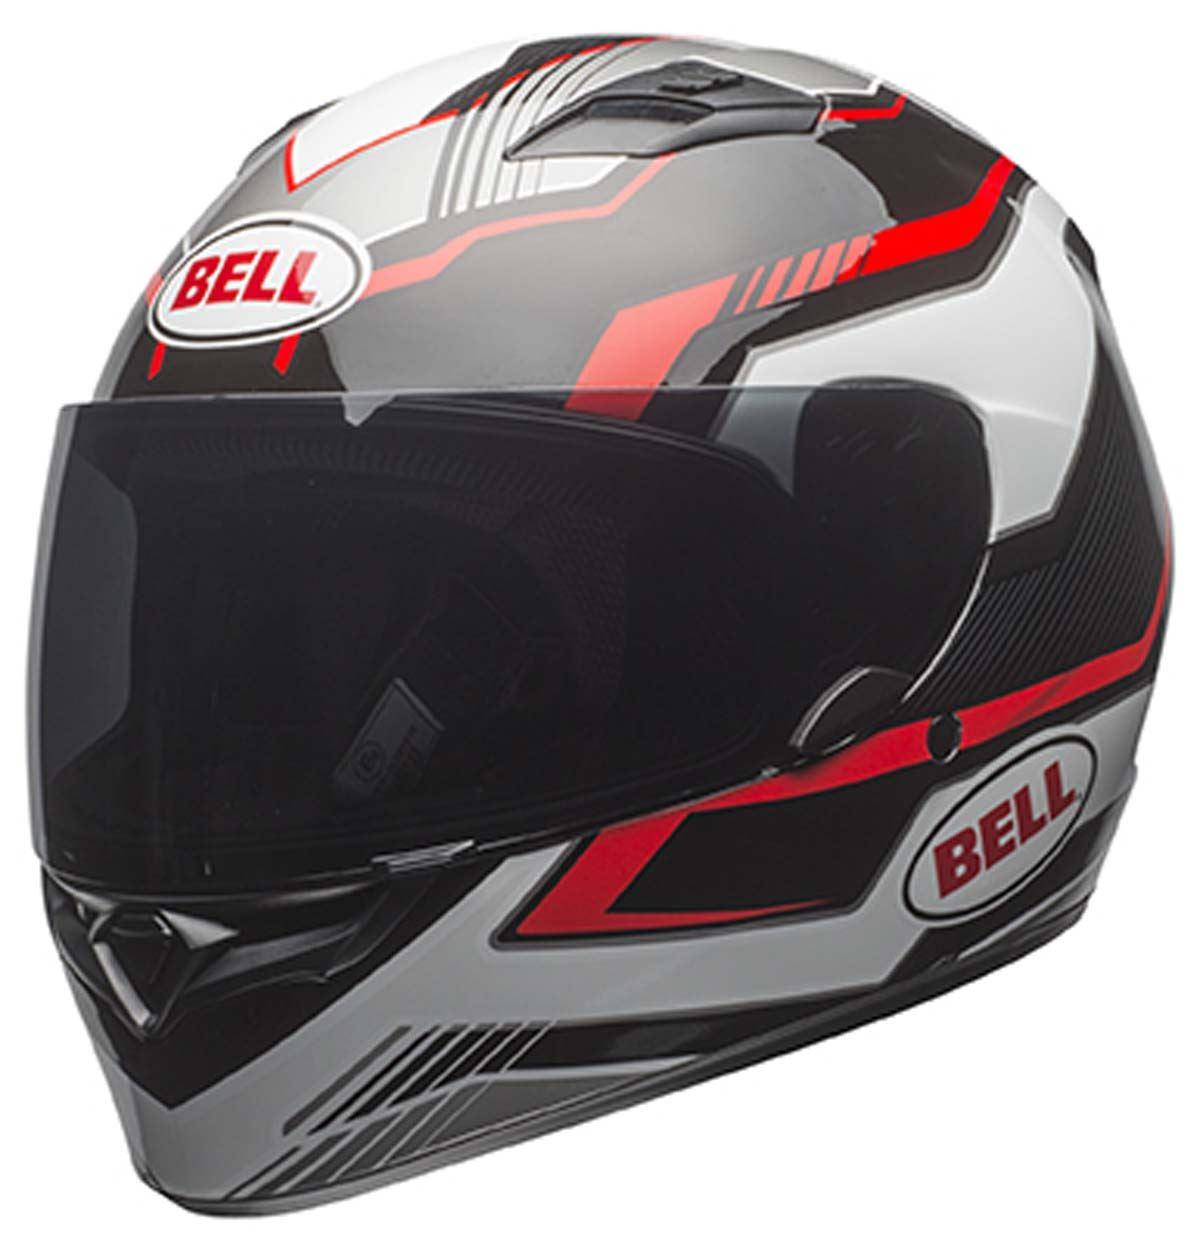 Bell-Qualifier-Helmet-Full-Face-Motorcycle-Clear-Shield-DOT-XS-3XL miniature 15